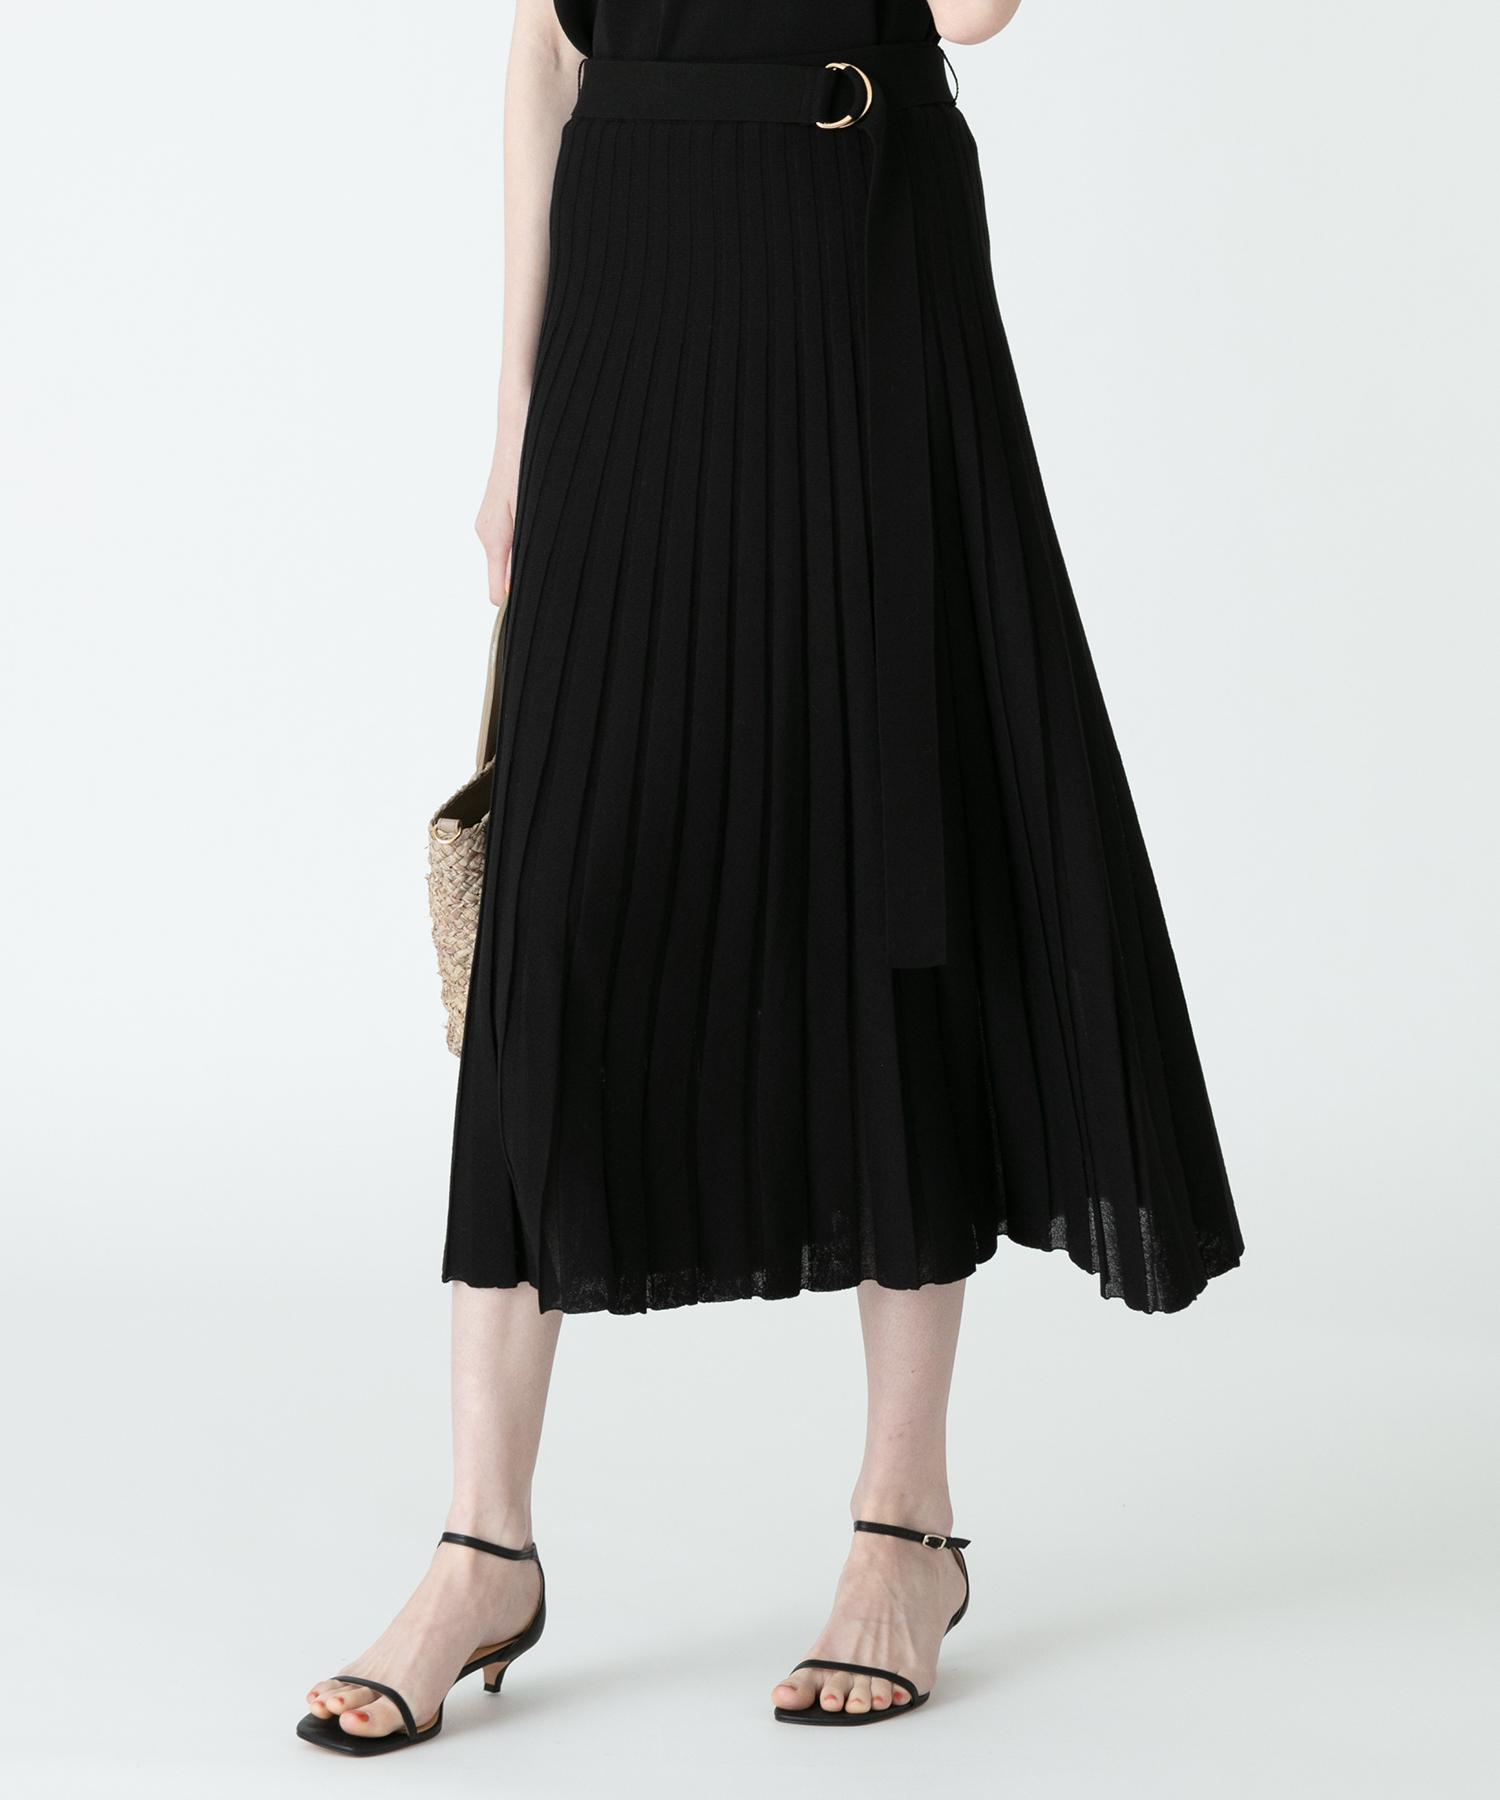 【LOULOU WILLOUGHBY】プリーツニットスカート